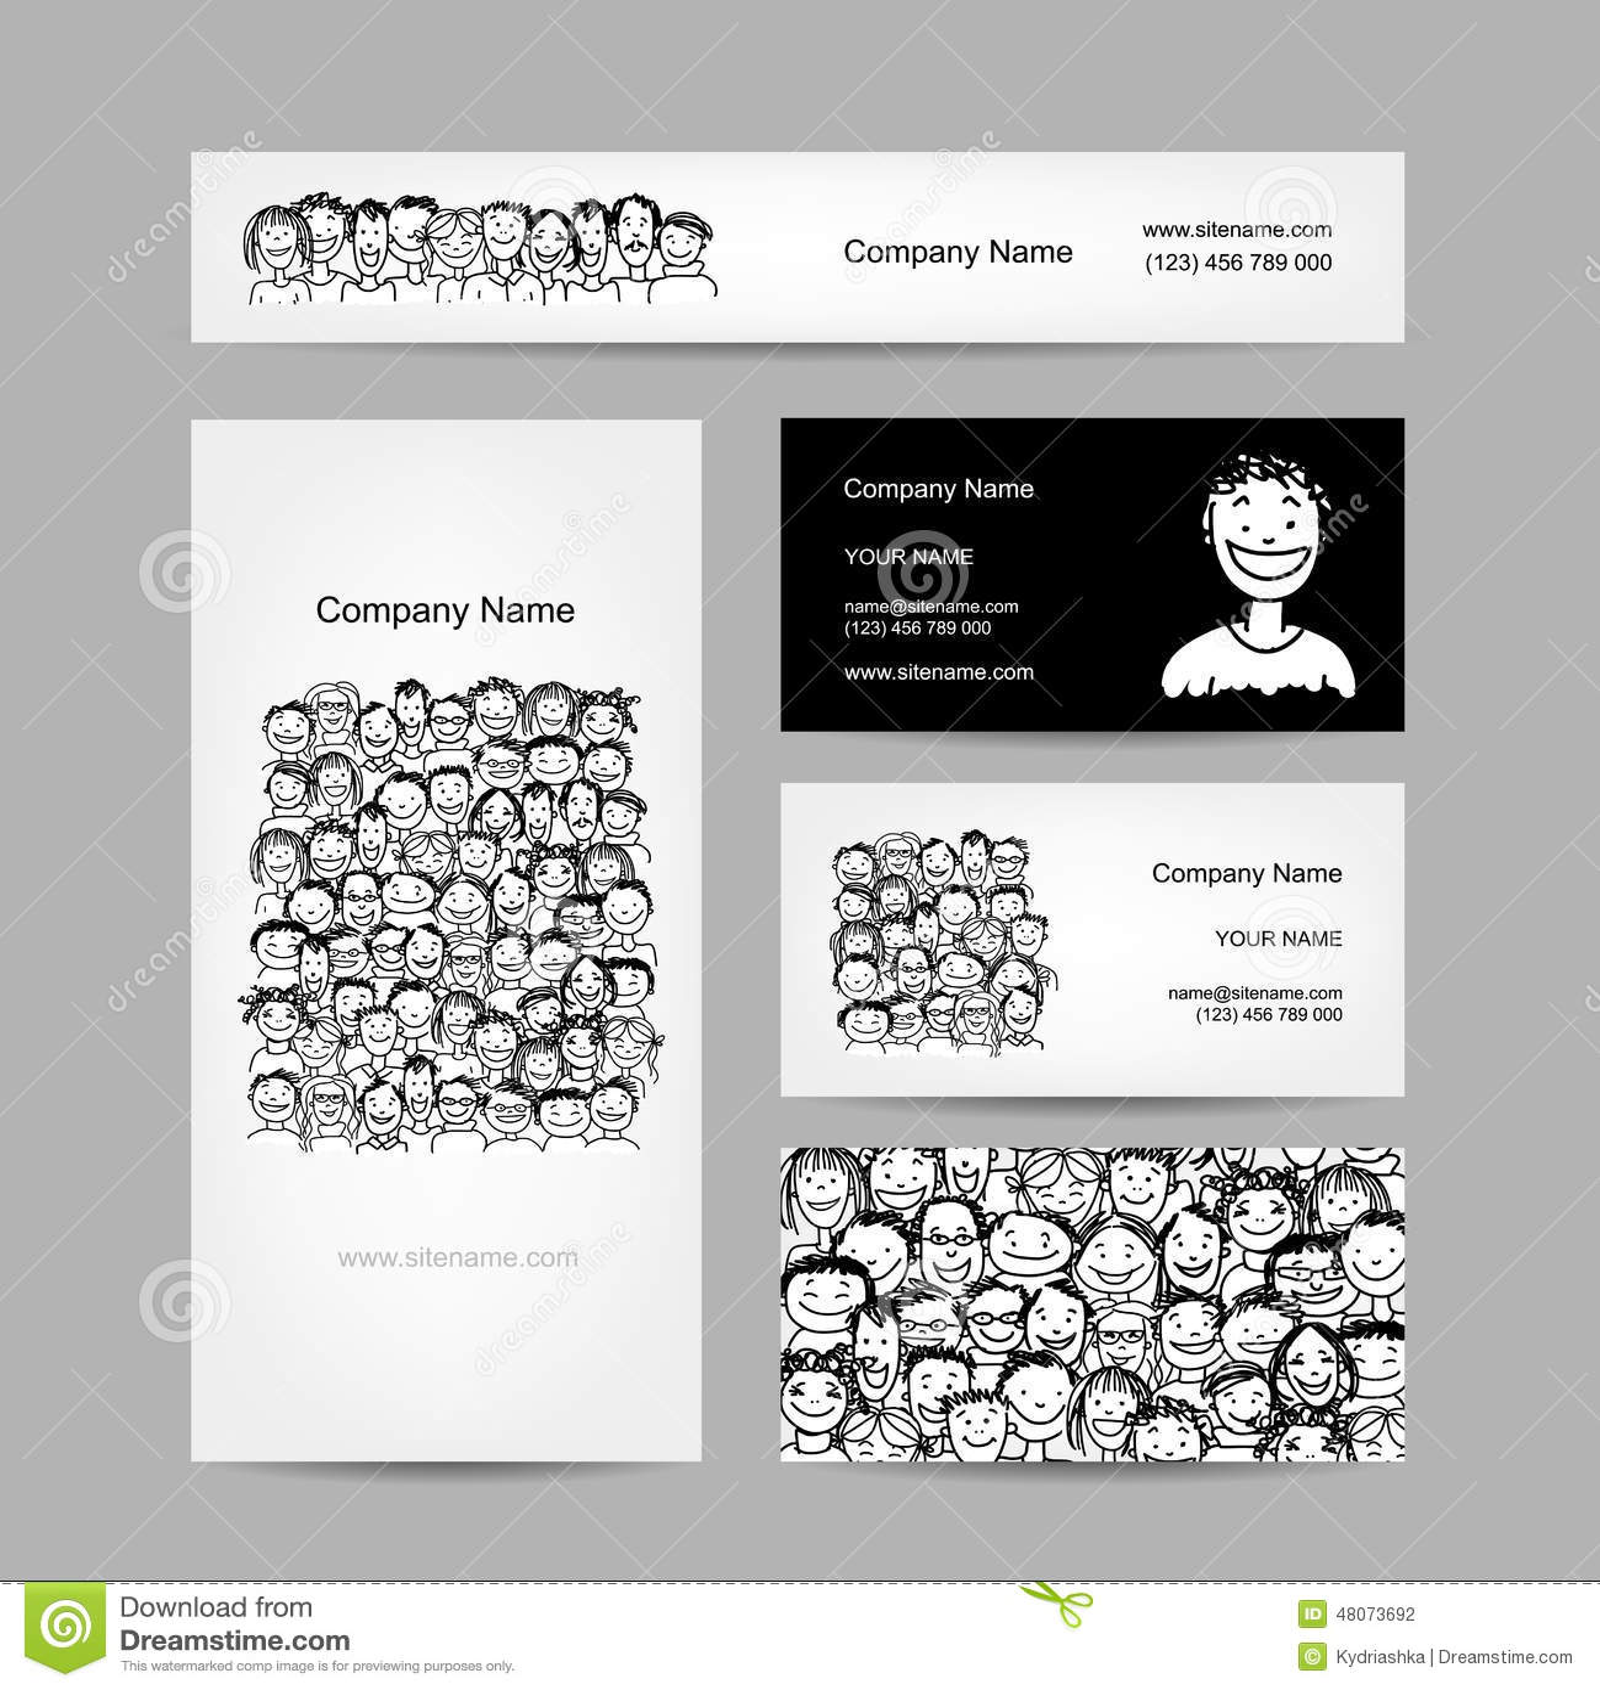 Visitenkarten Sammlung Leutemengendesign Vektor Abbildung